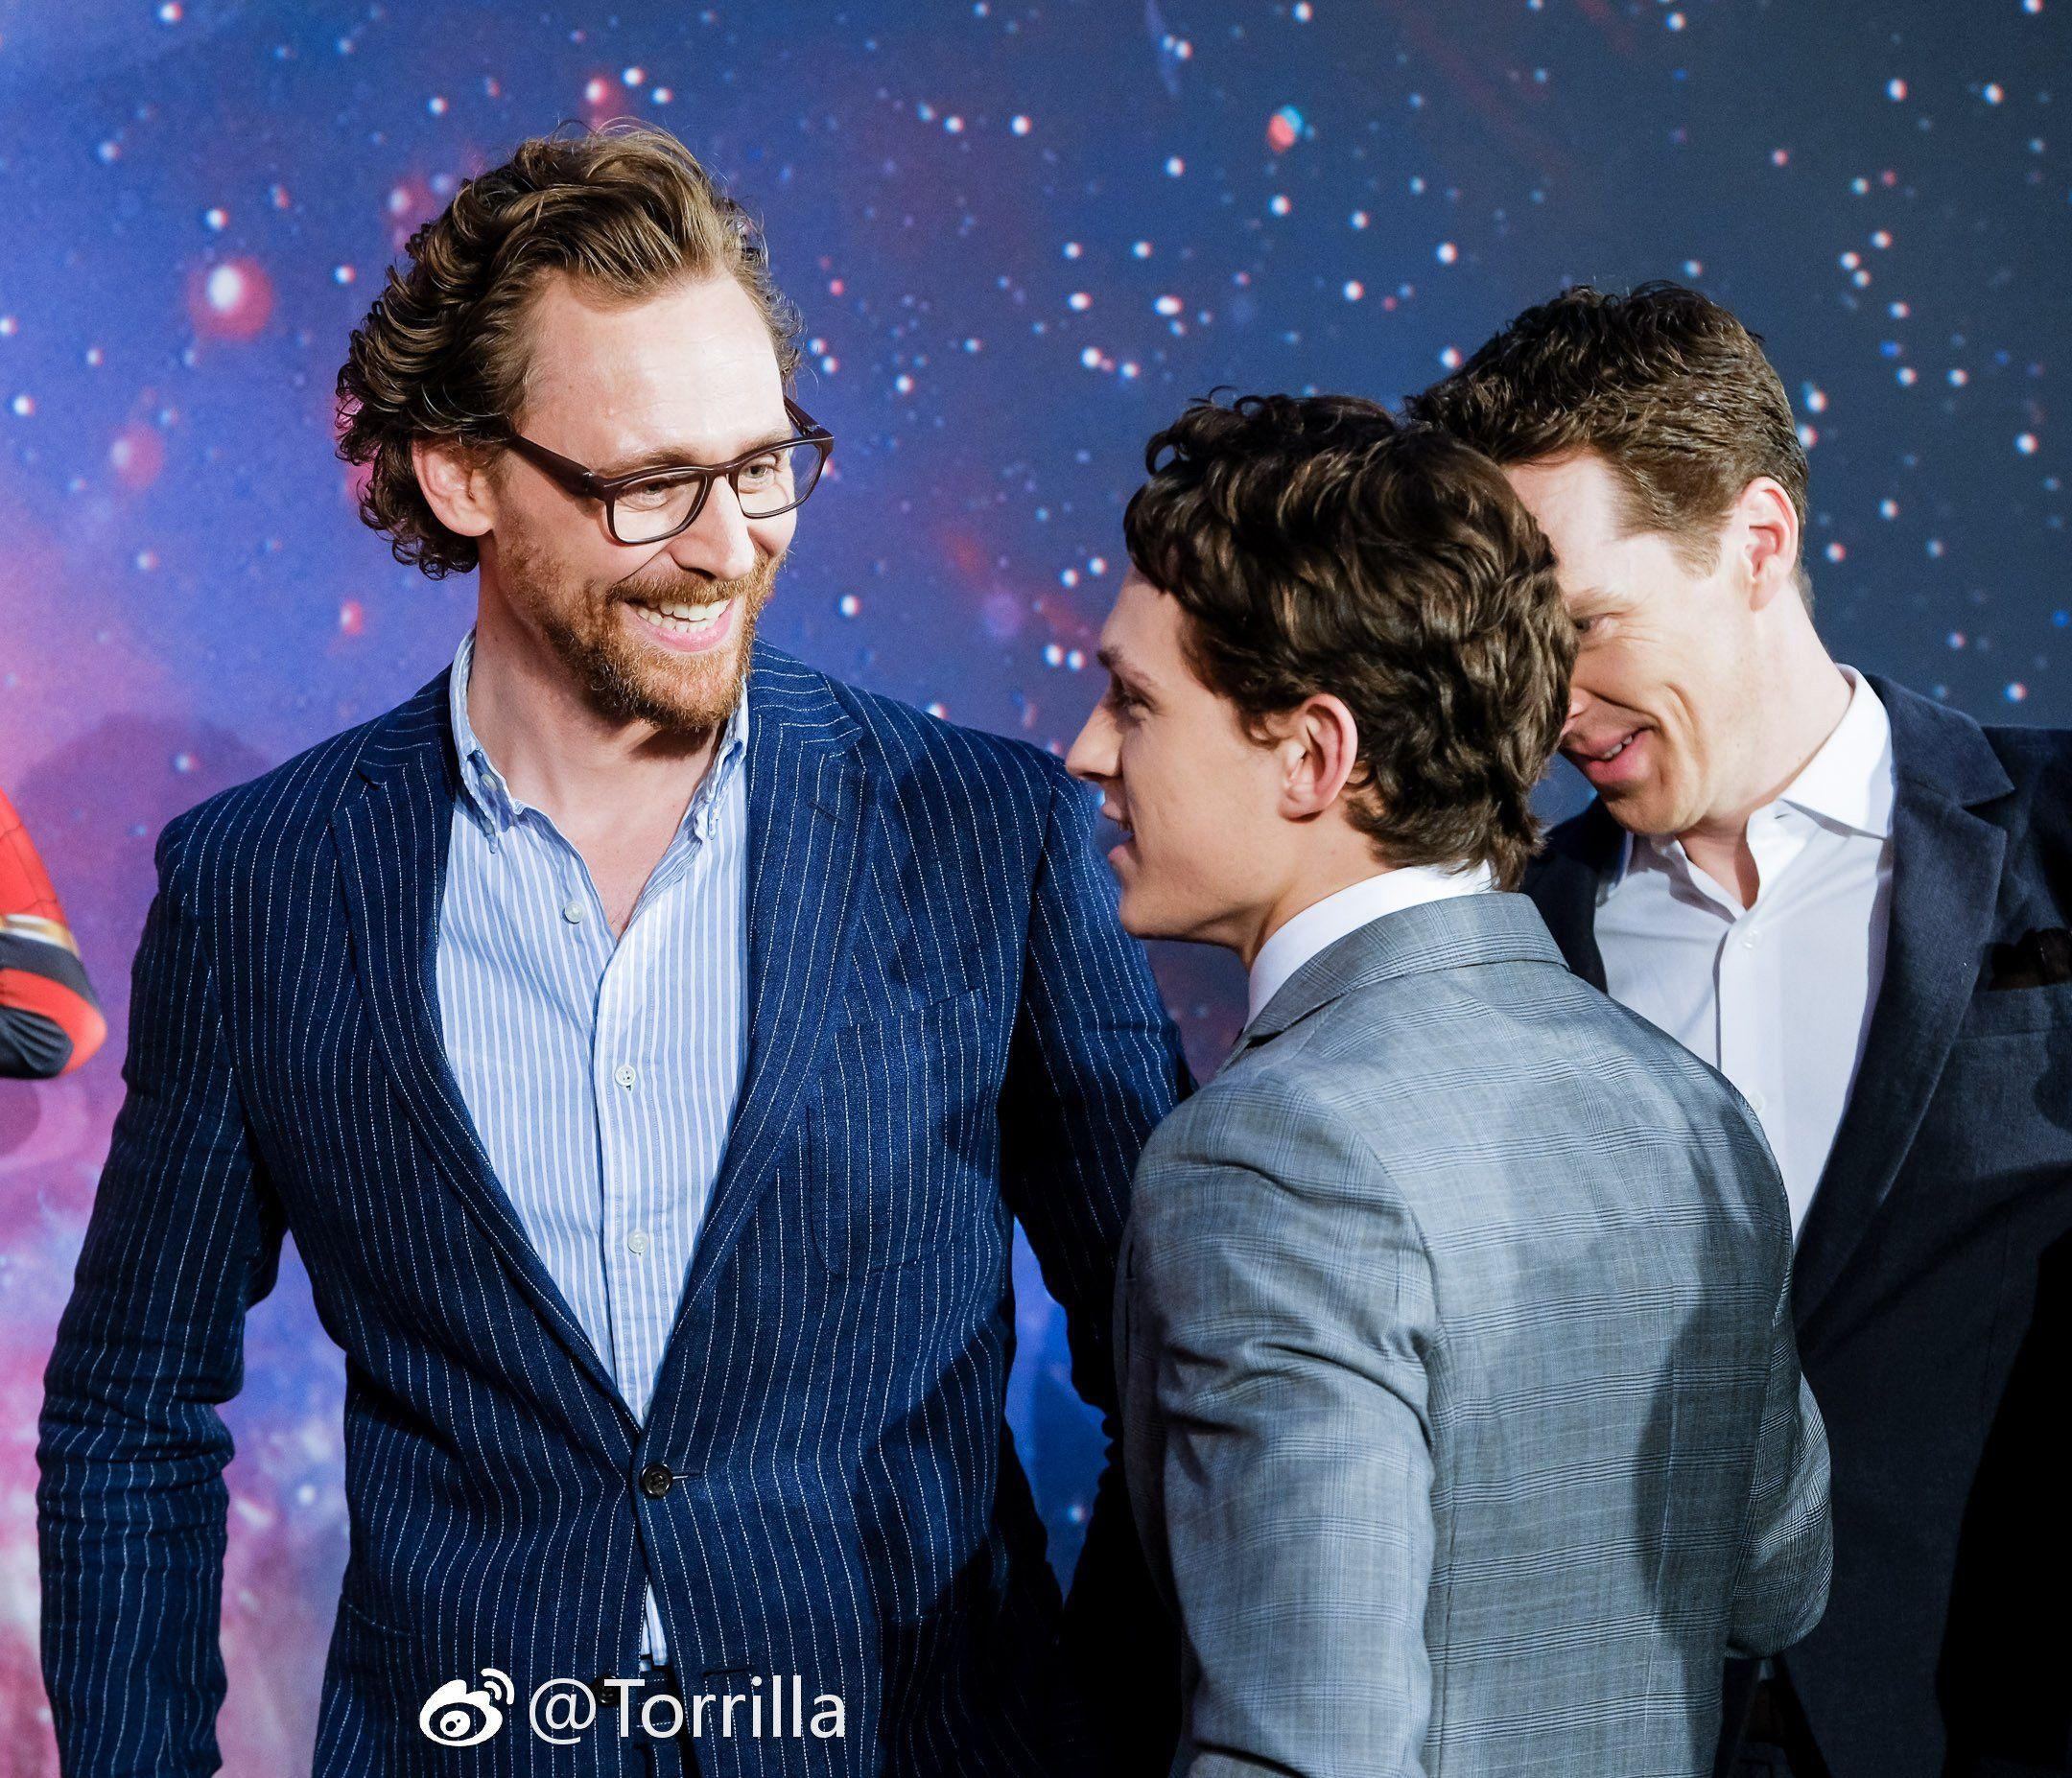 Tom Holland And Tom Hiddleston